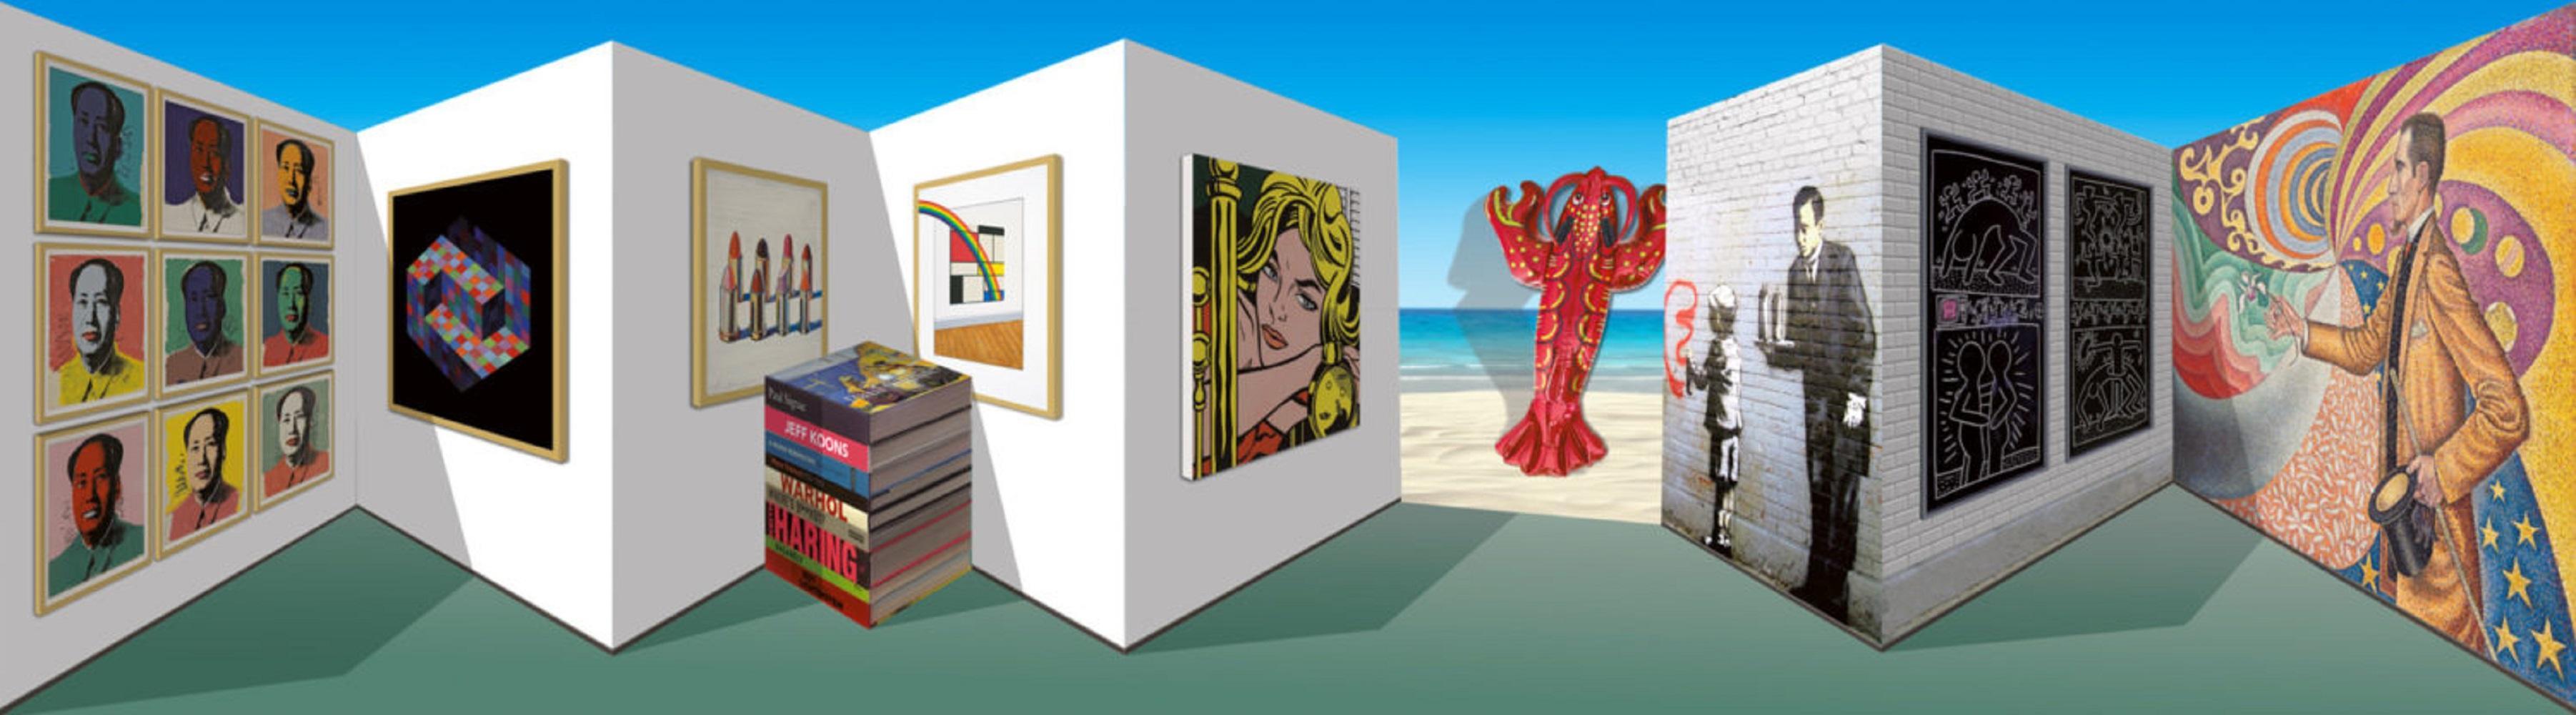 Patrick Hughes - Popsee, contemporary, op art, optical, reverspective, artworks